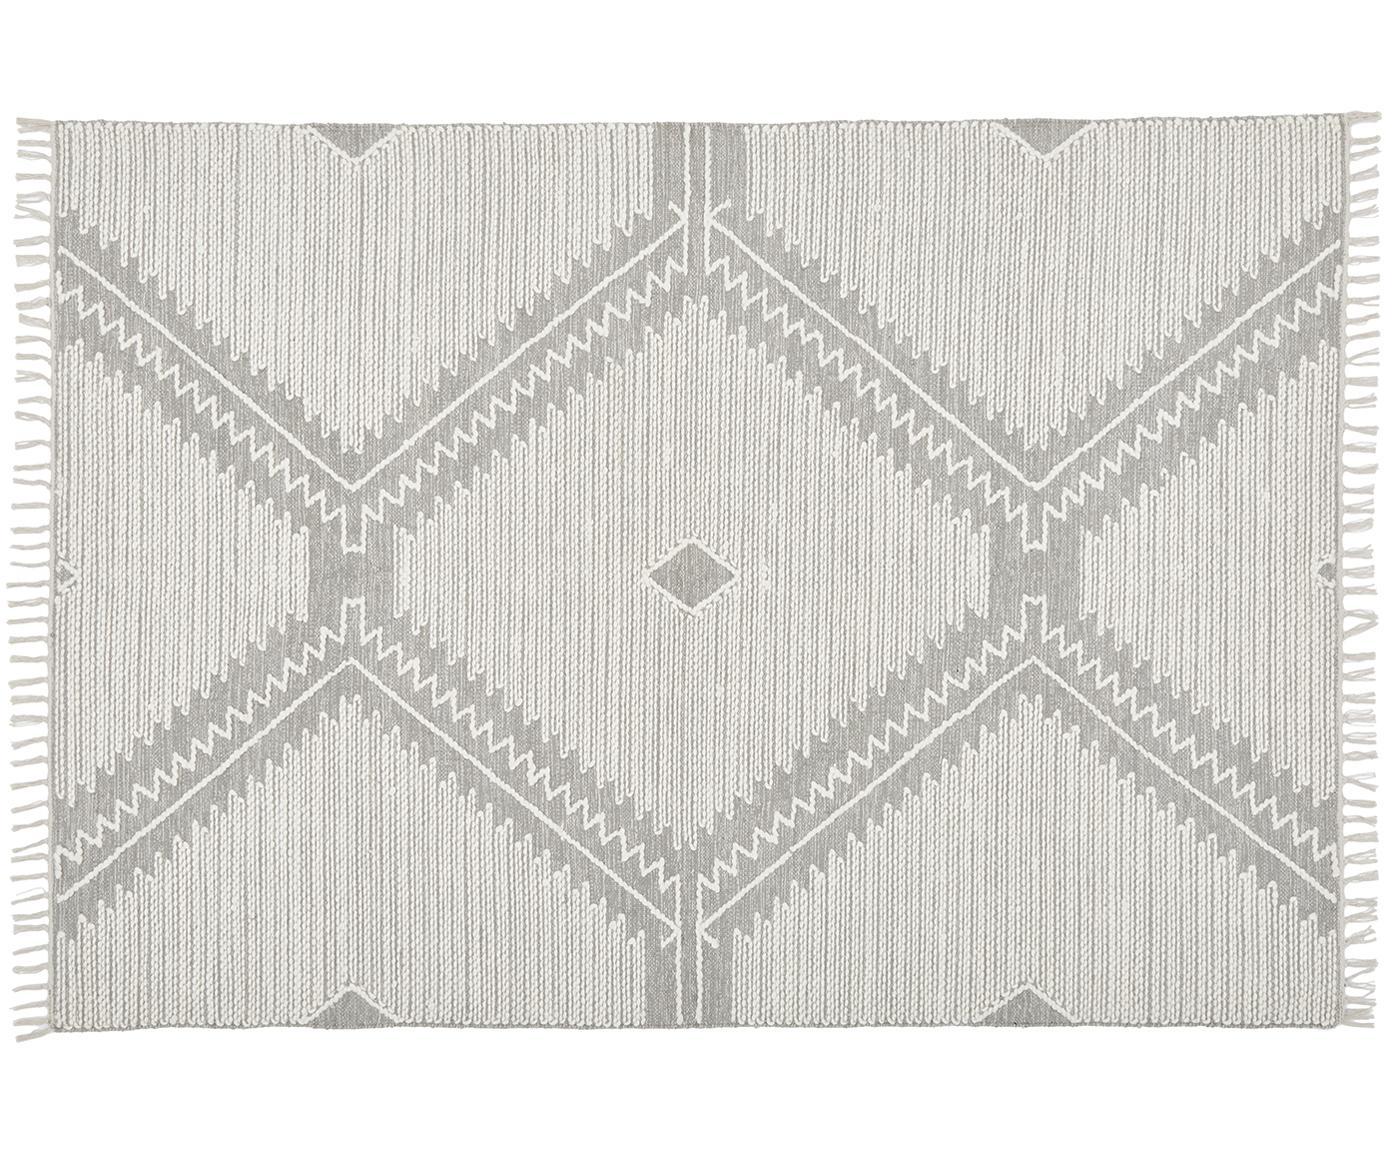 Tappeto tessuto a mano Karola, Grigio, crema, Larg. 160 x Lung. 230 cm (taglia M)